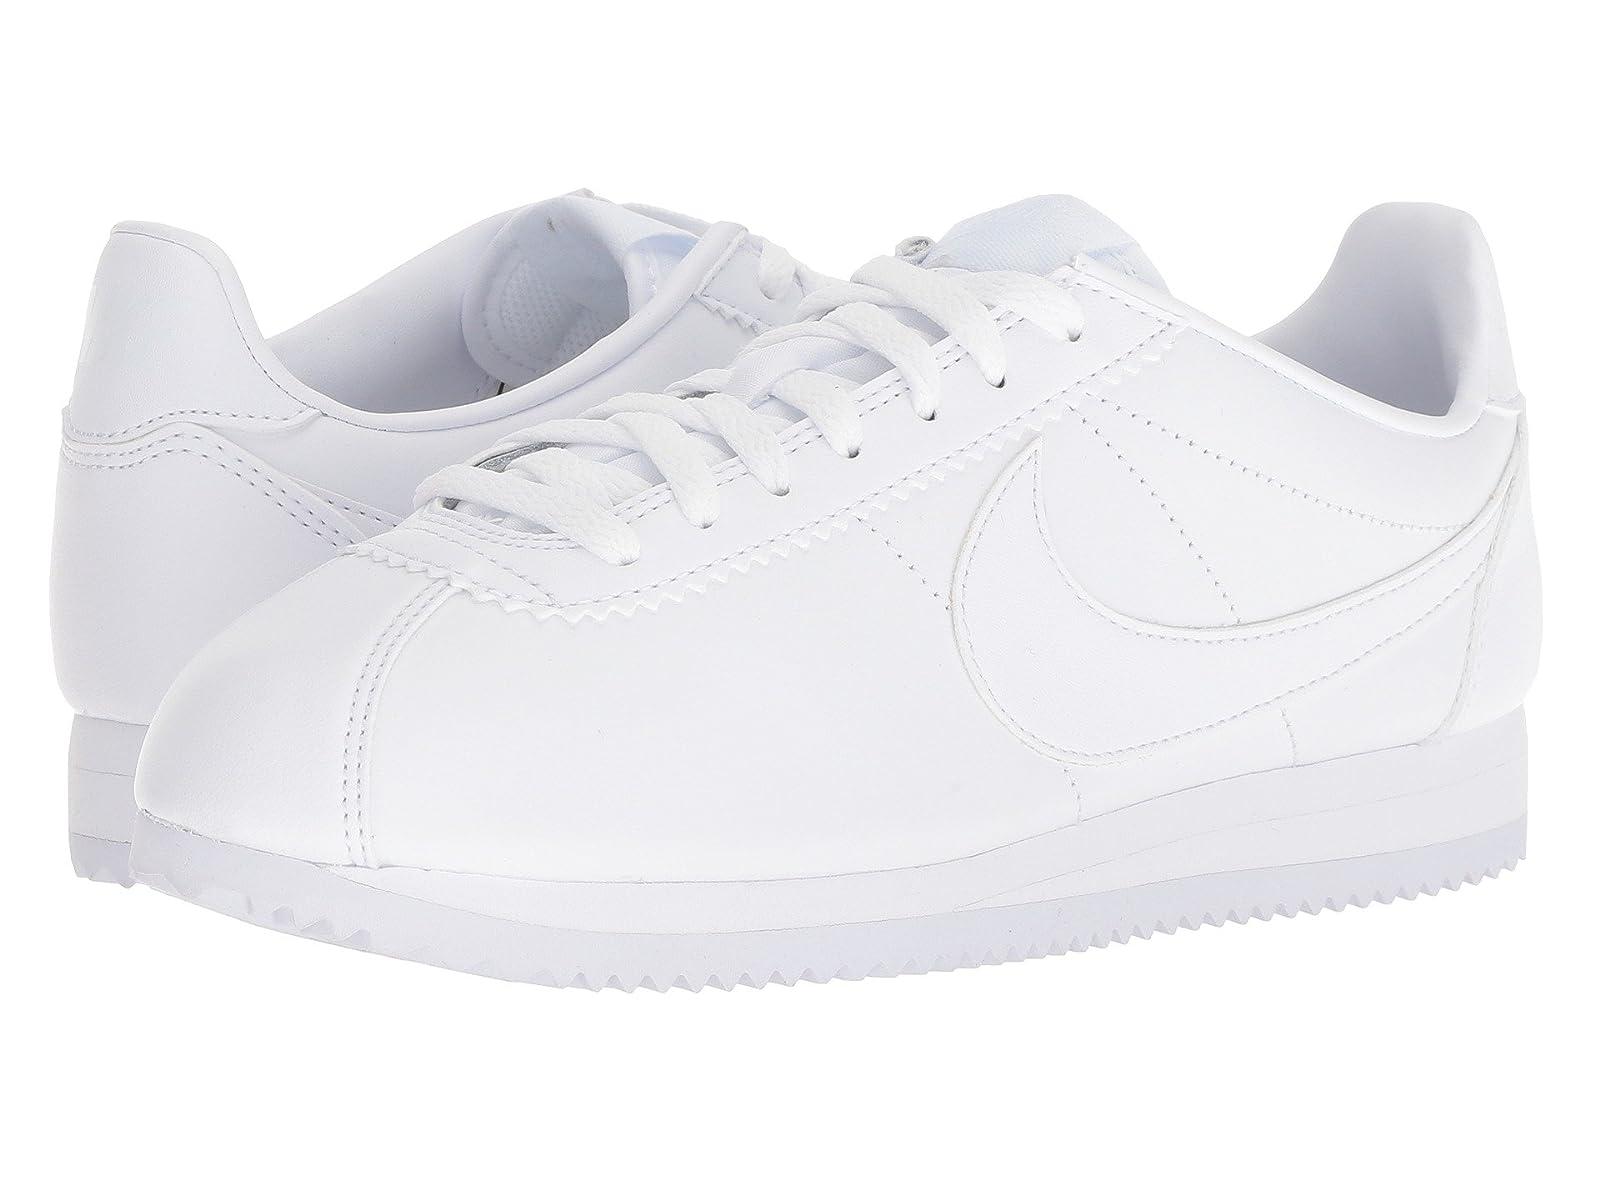 Nike Classic Cortez LeatherAtmospheric grades have affordable shoes